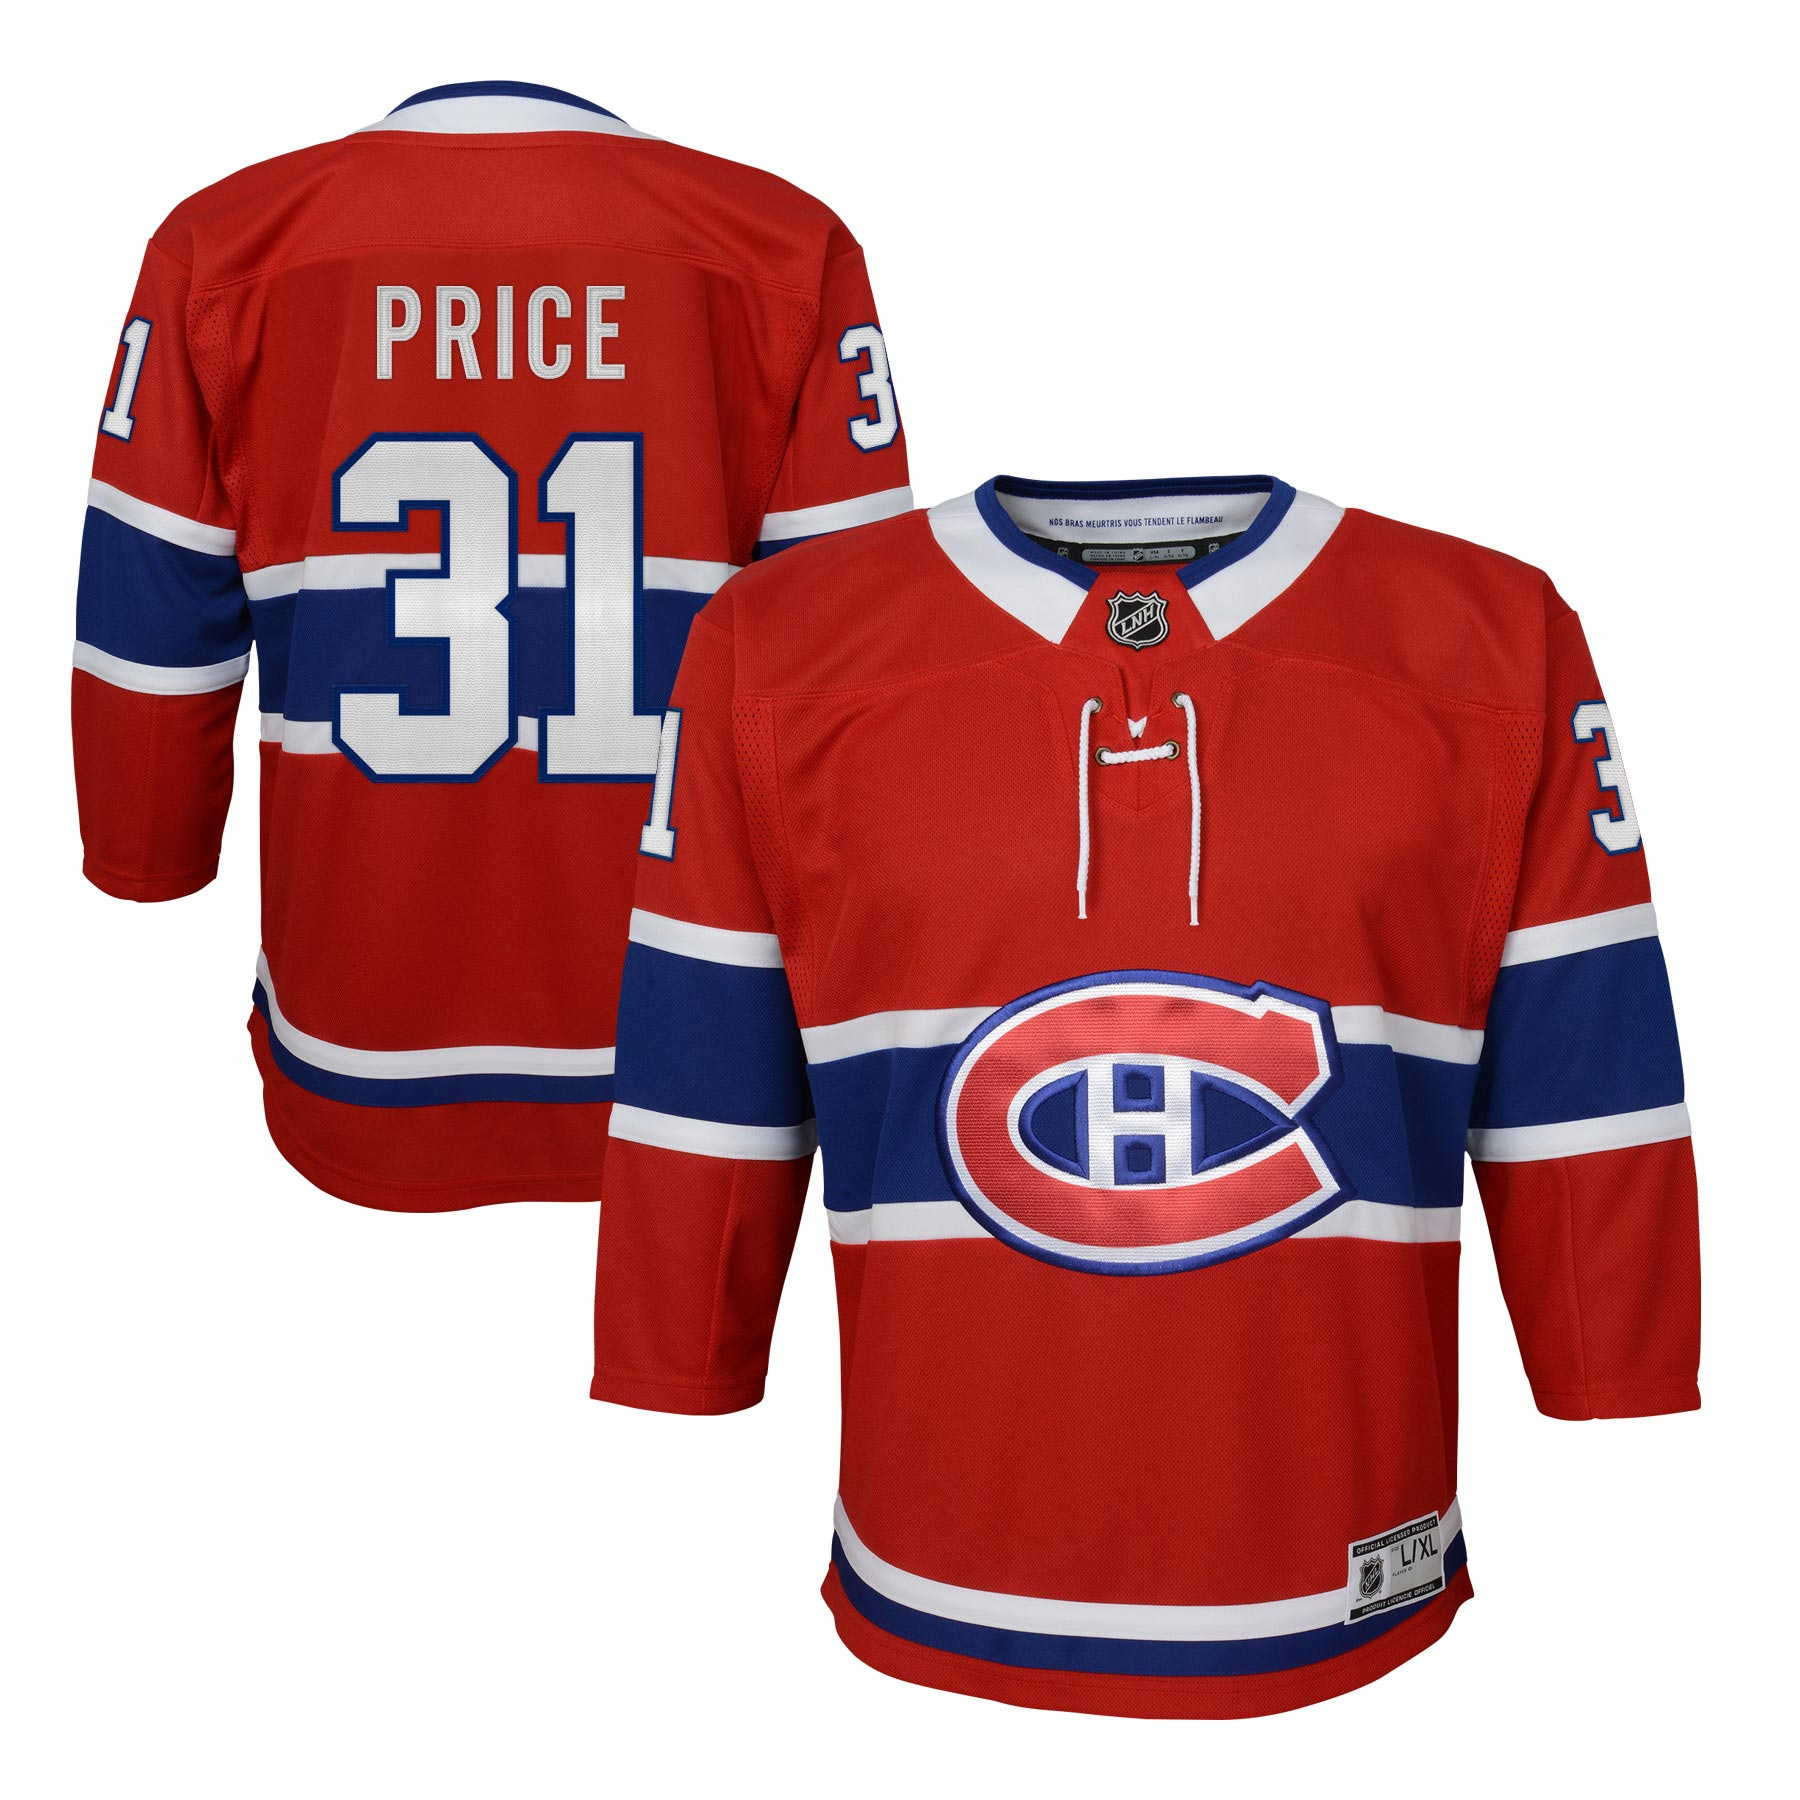 ... australia carey price montreal canadiens nhl premier youth replica  hockey jersey nhl team apparel 441e8 143de e79f4945f